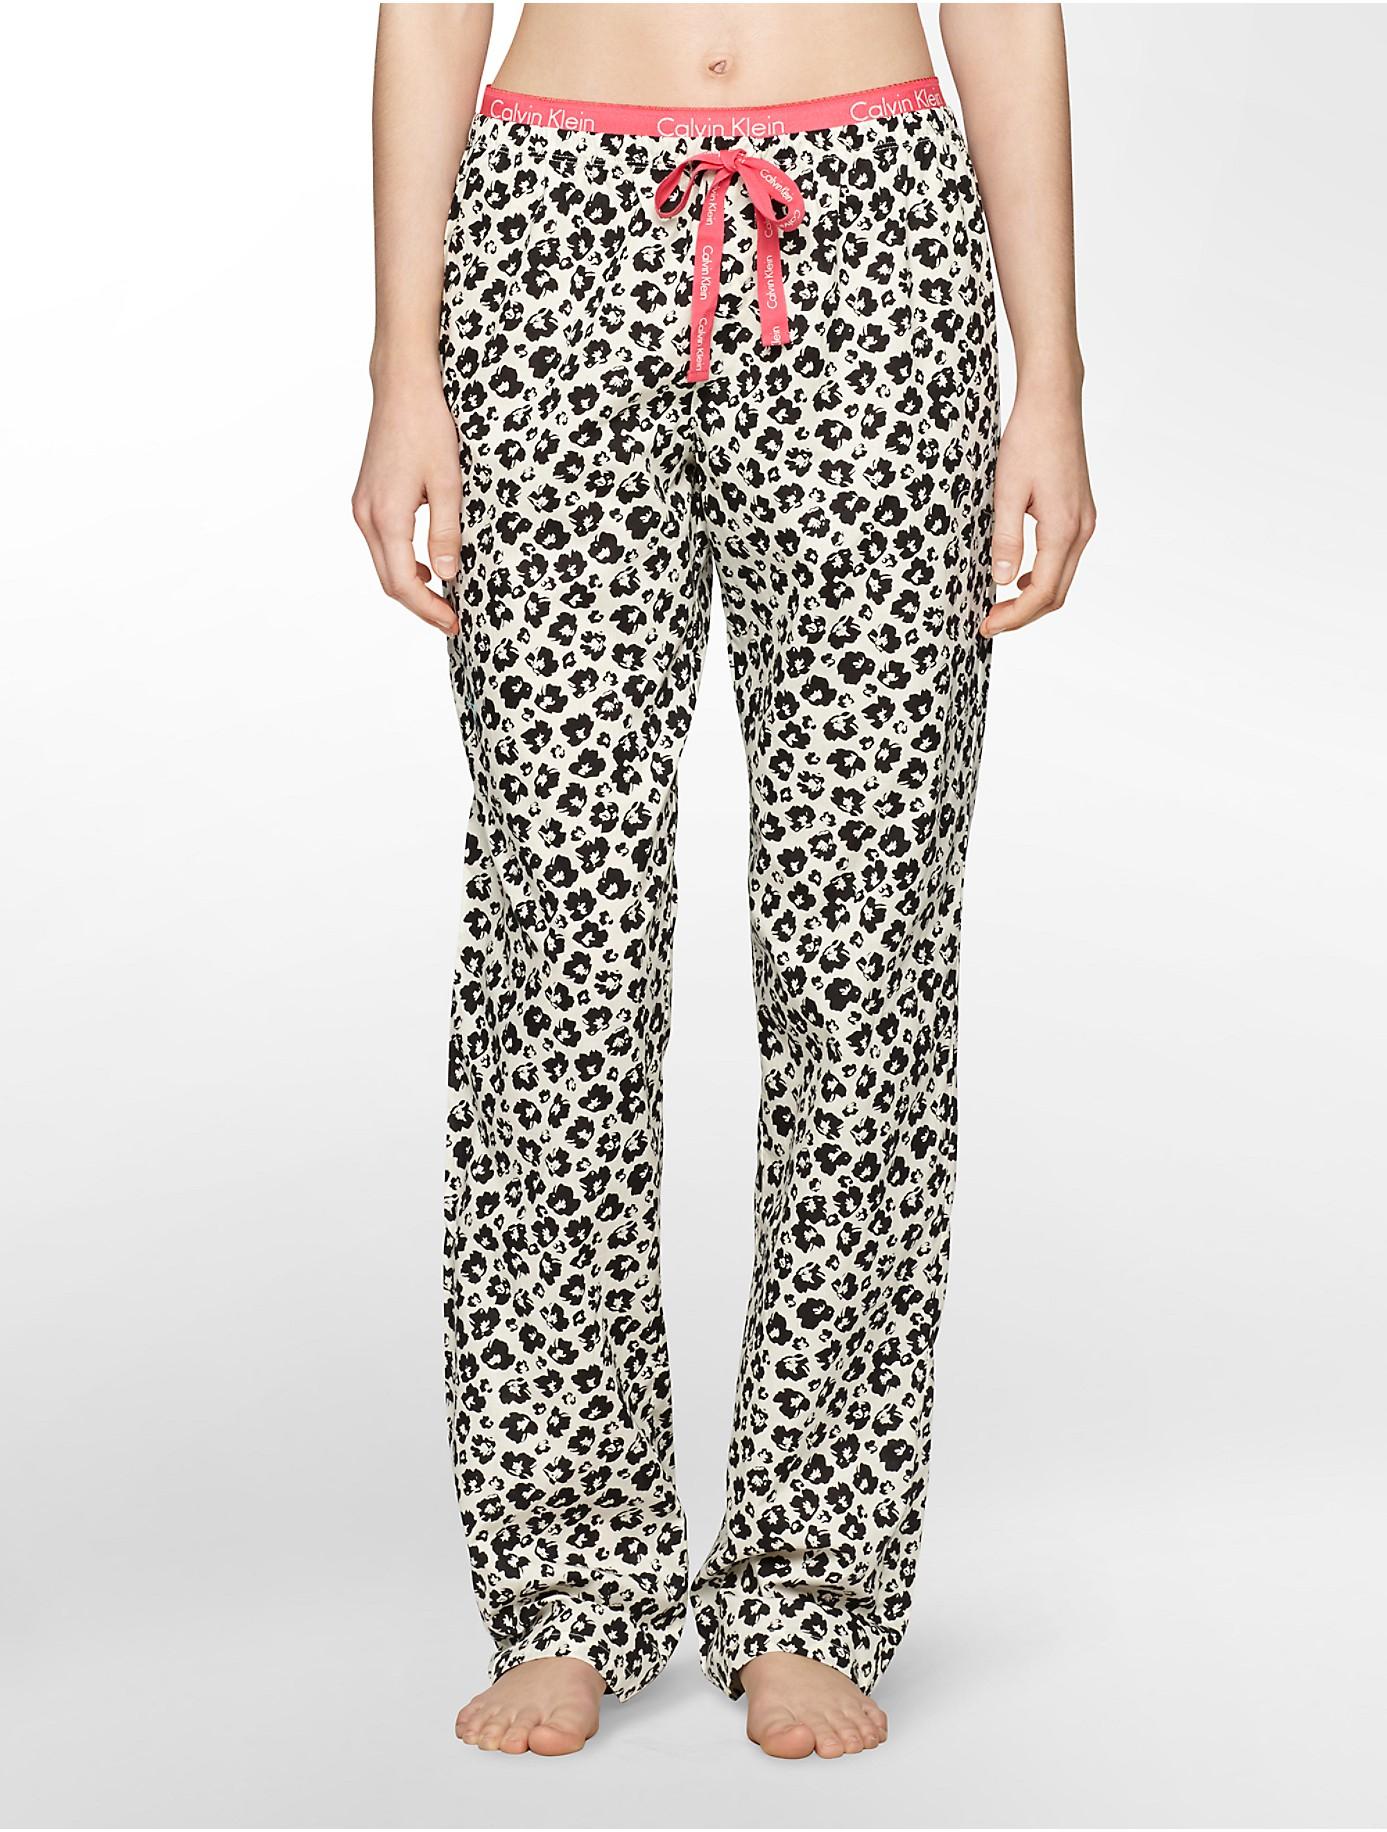 Lyst Calvin Klein Underwear Wovens Print Pajama Pants